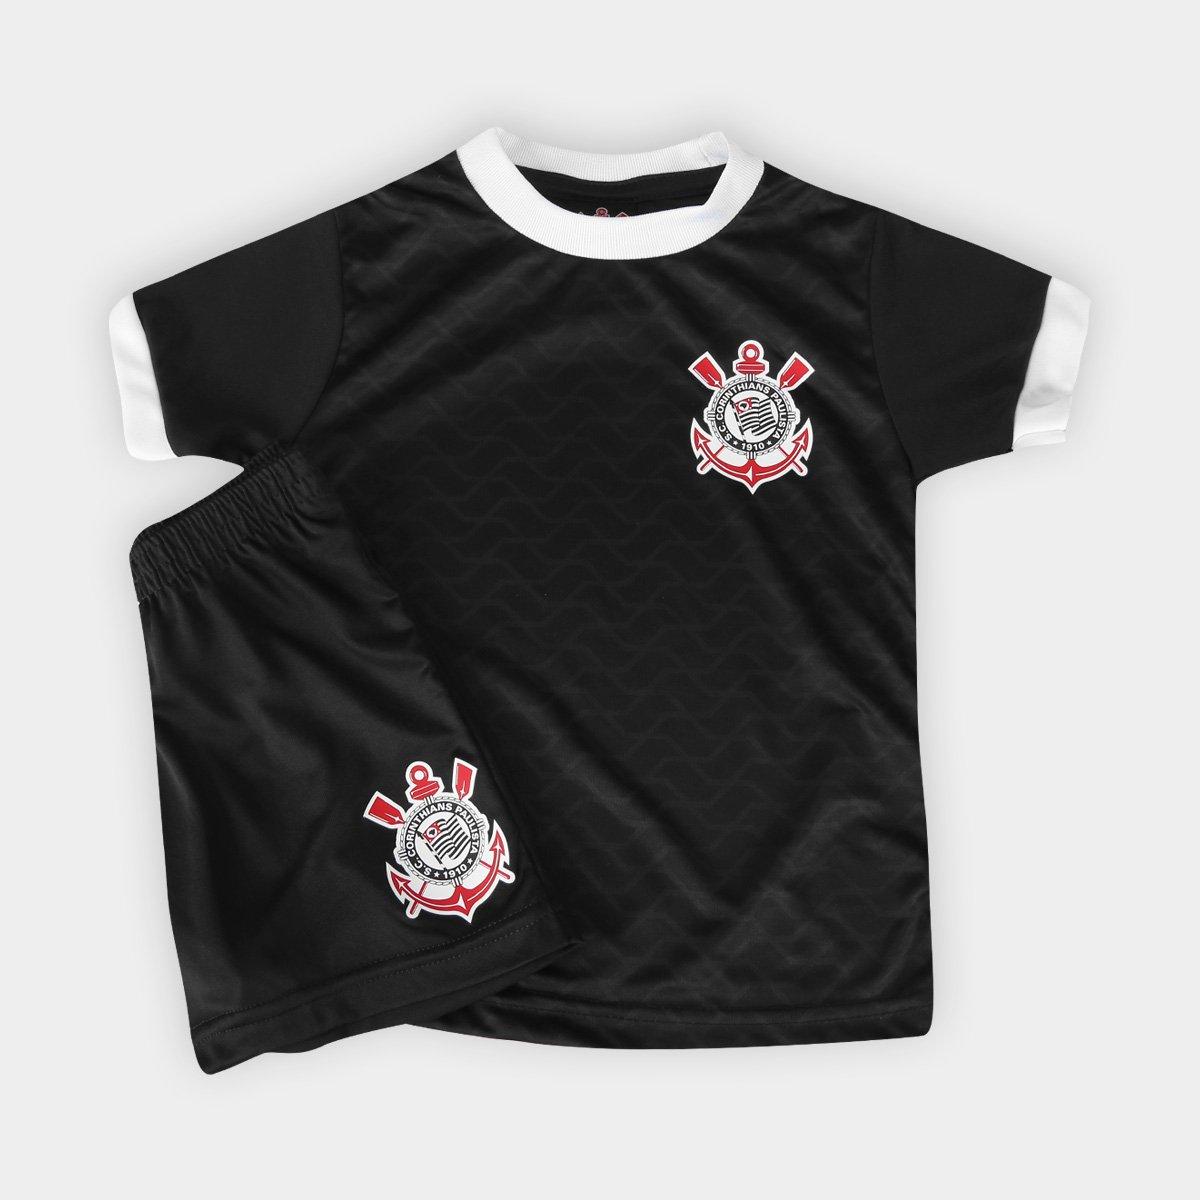 c0c61938e474d Conjunto Corinthians Libertados Infantil - Compre Agora